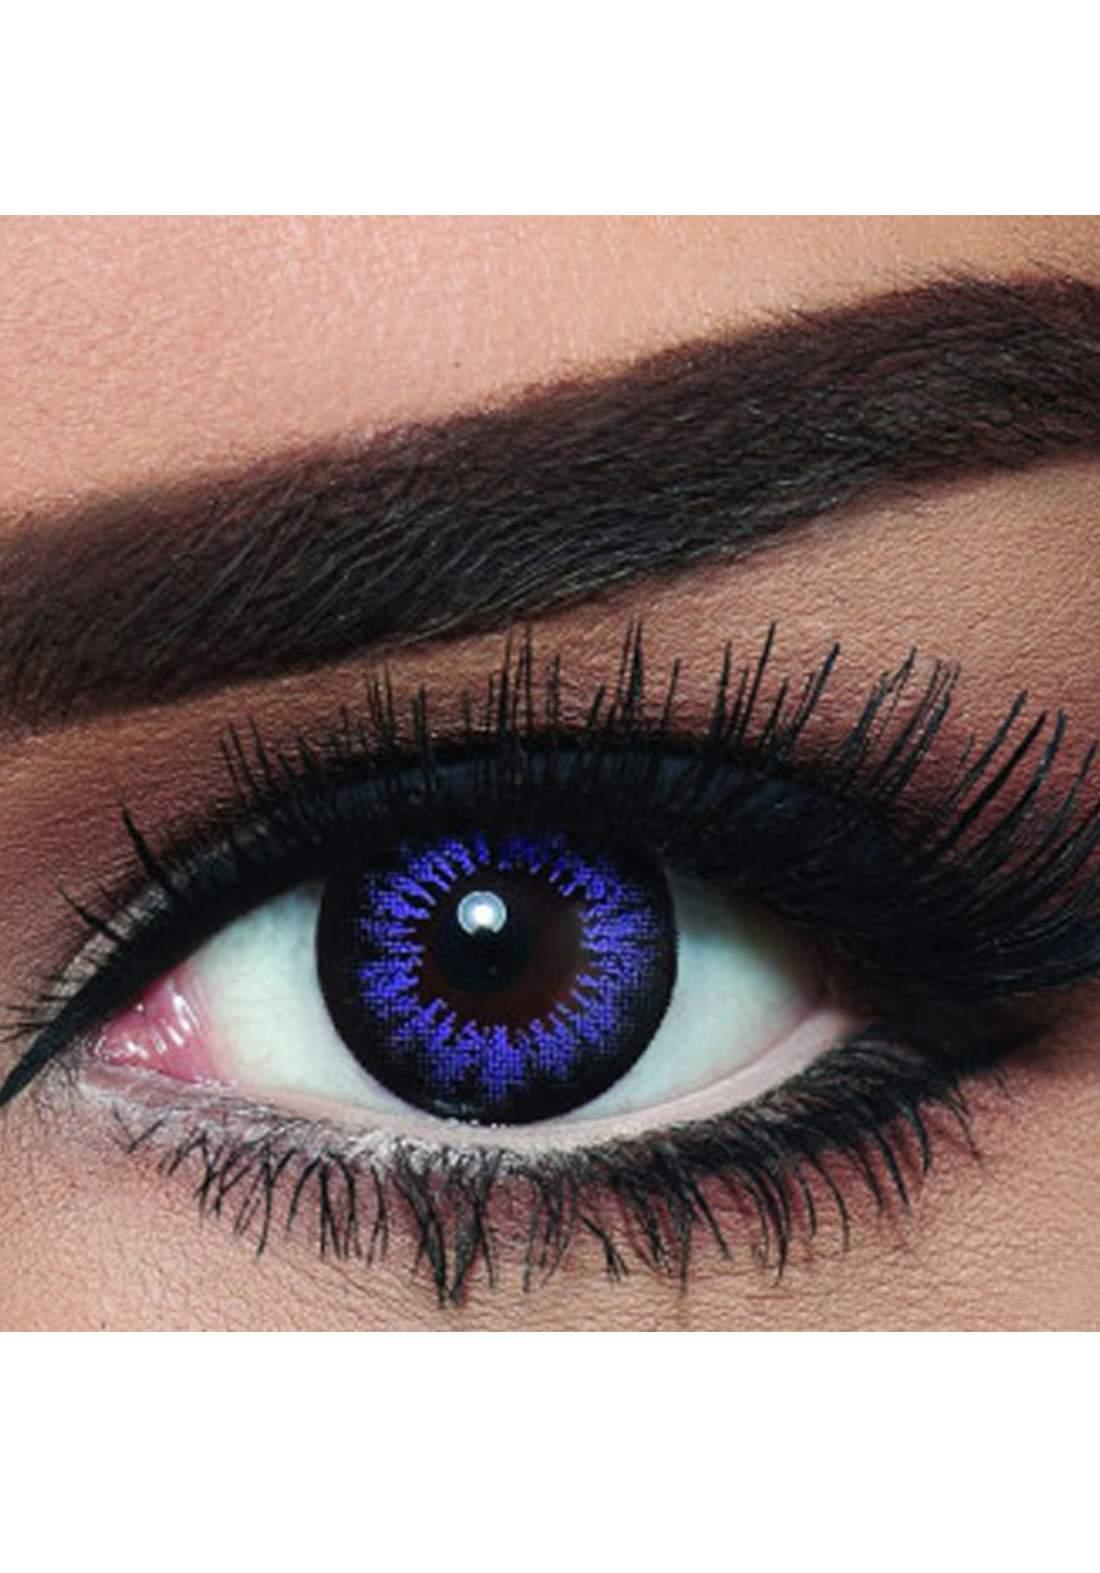 Bella Classic 301035 Contact Lenses 3 Months Use Snow White - Violet  No.36 عدسات لاصقة